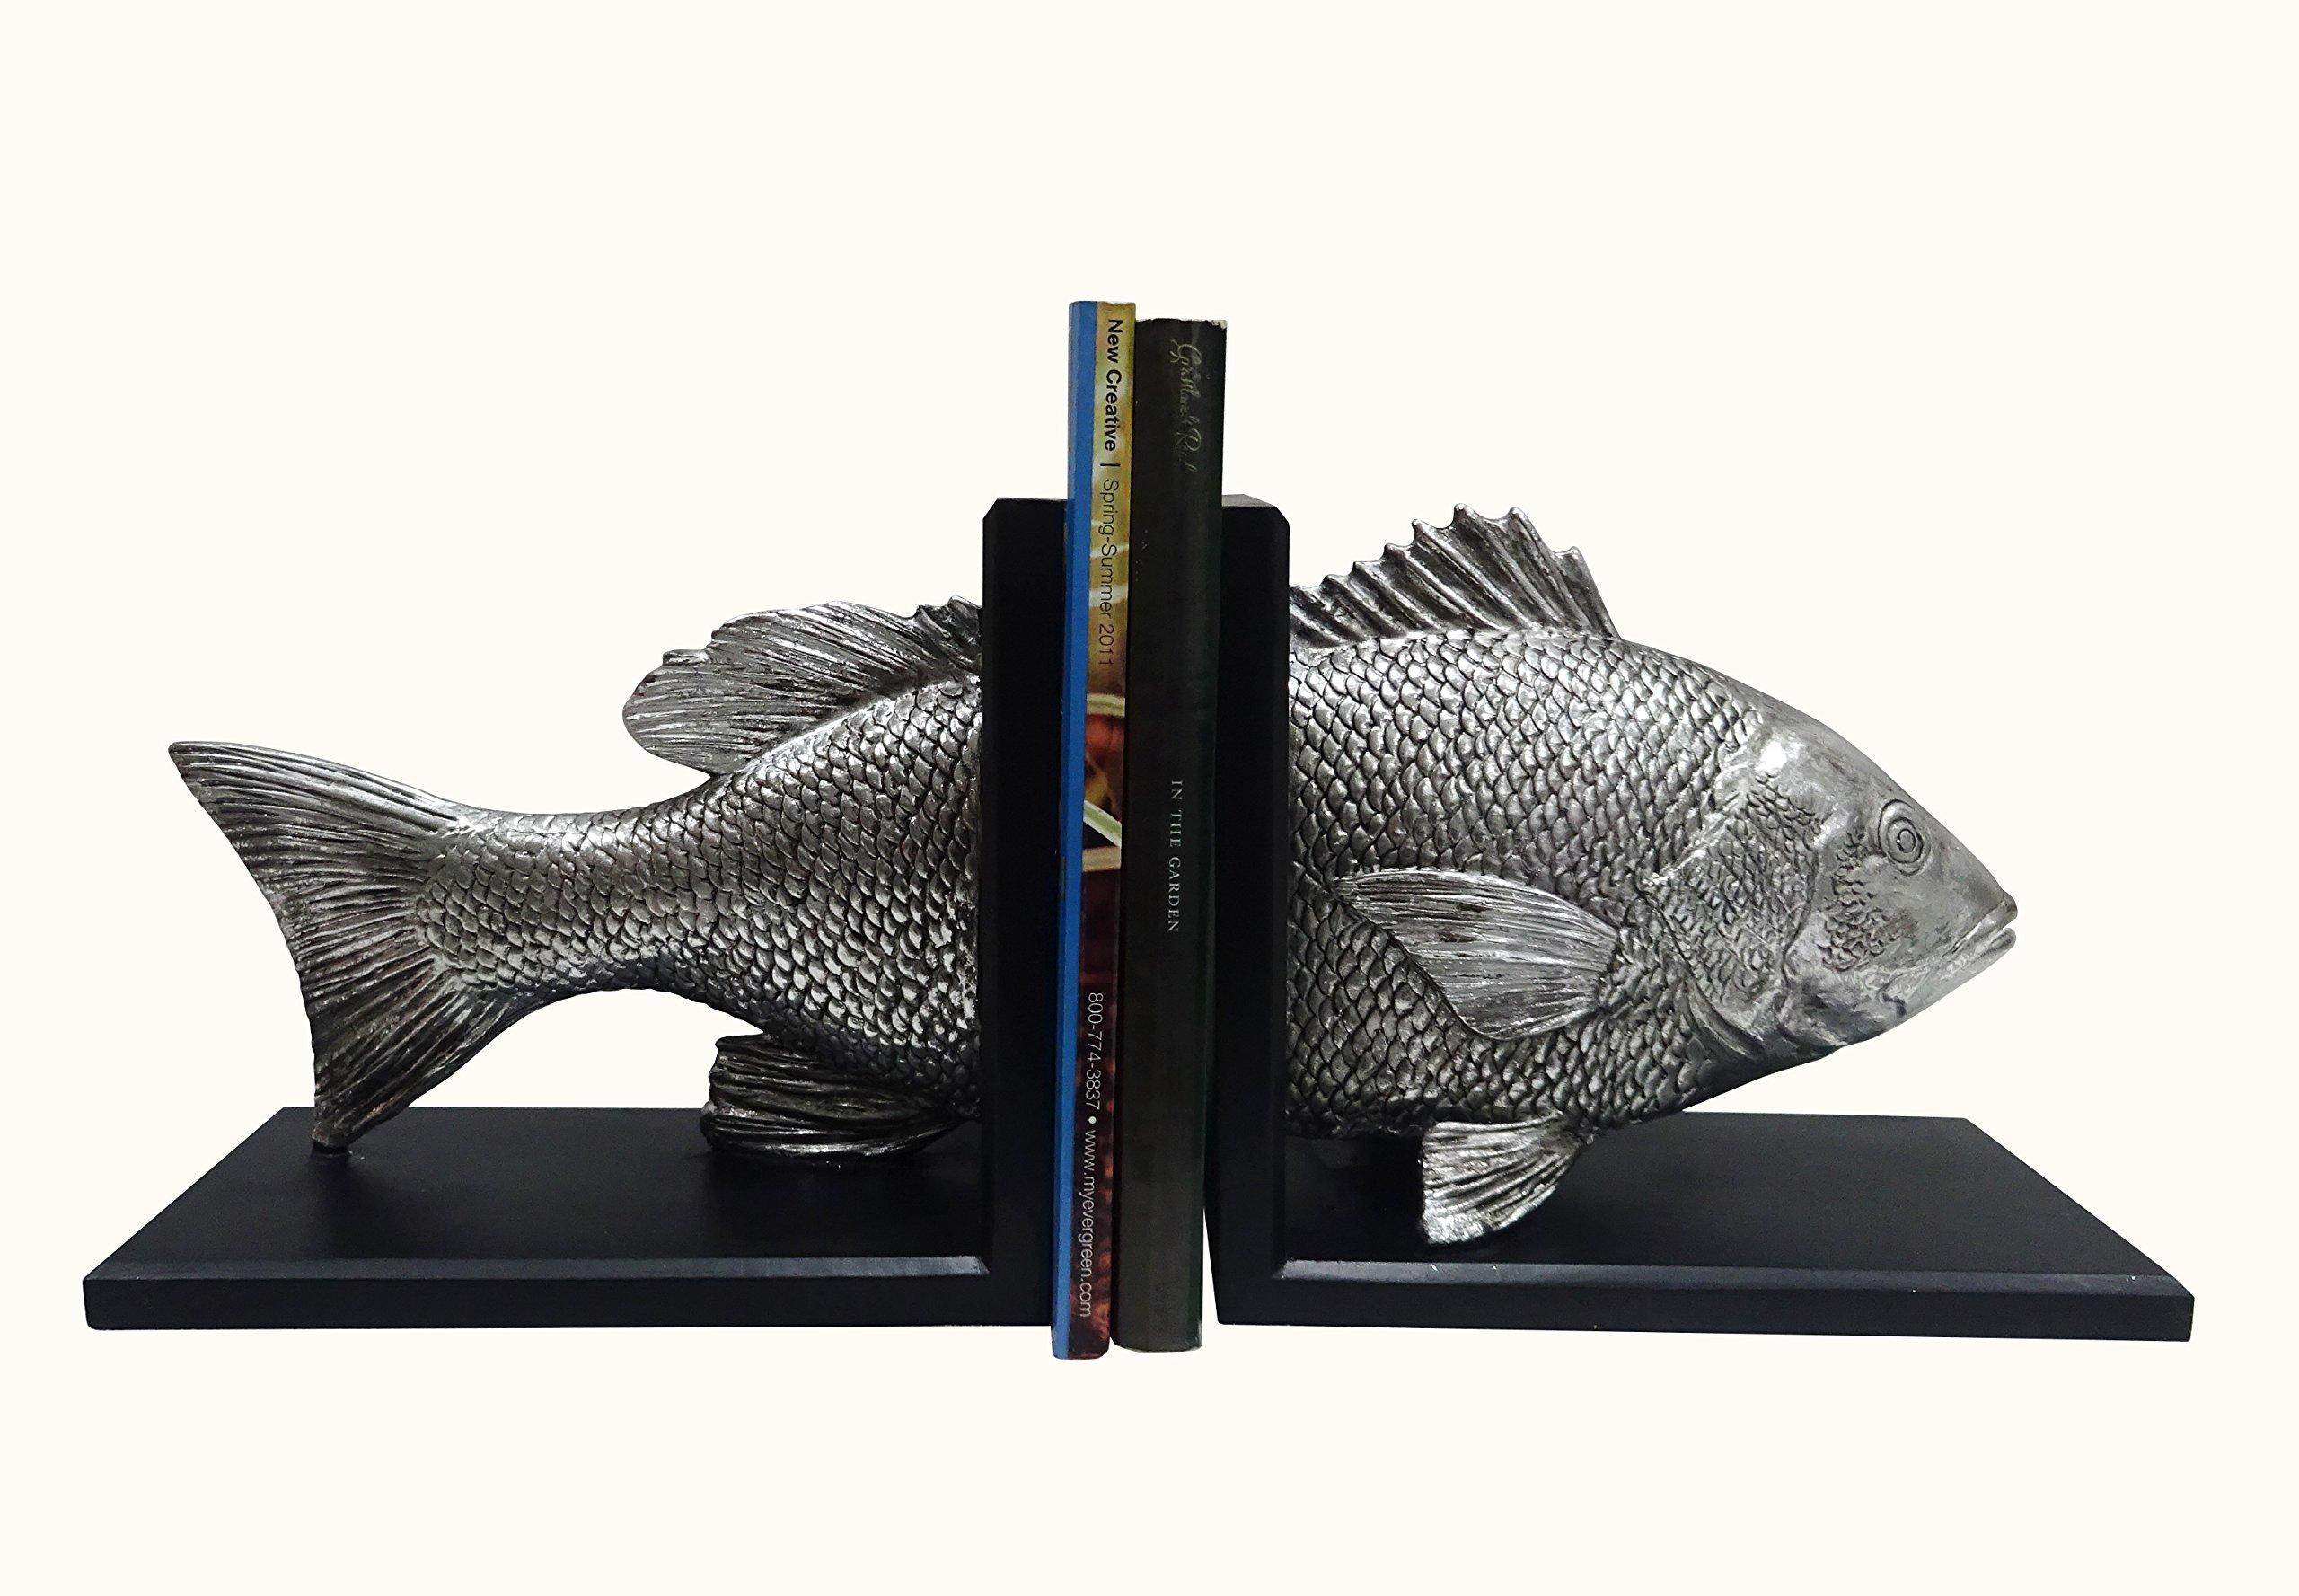 Clint Eagar Snapper Fish Figurine Bookends, 21'' L x 5.75'' W x 9'' H